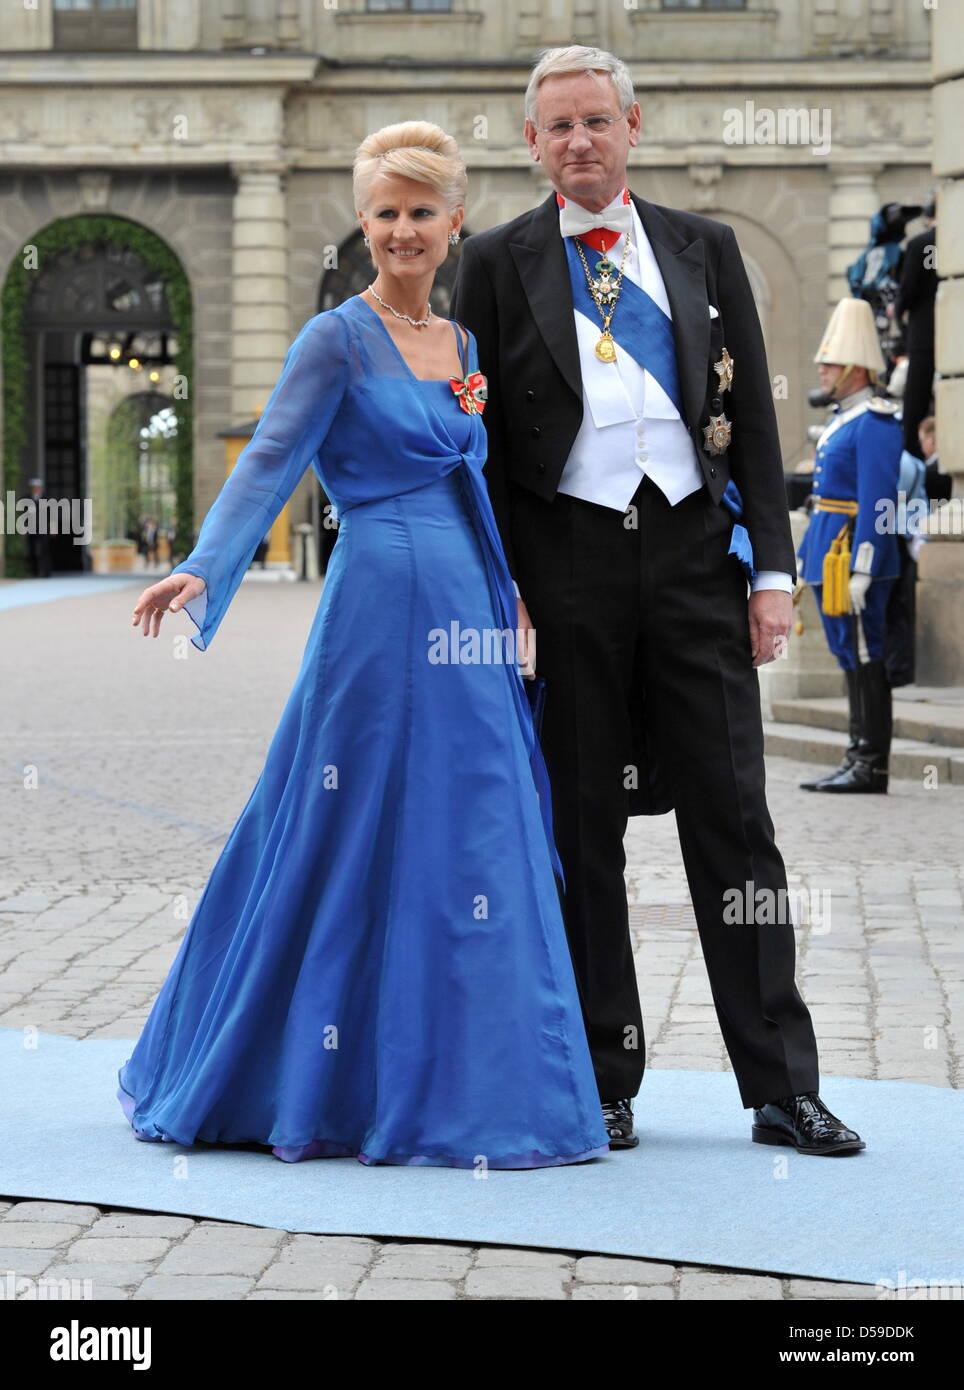 Swedish Politician And Diplomat Carl Bildt And Wife Anna Maria